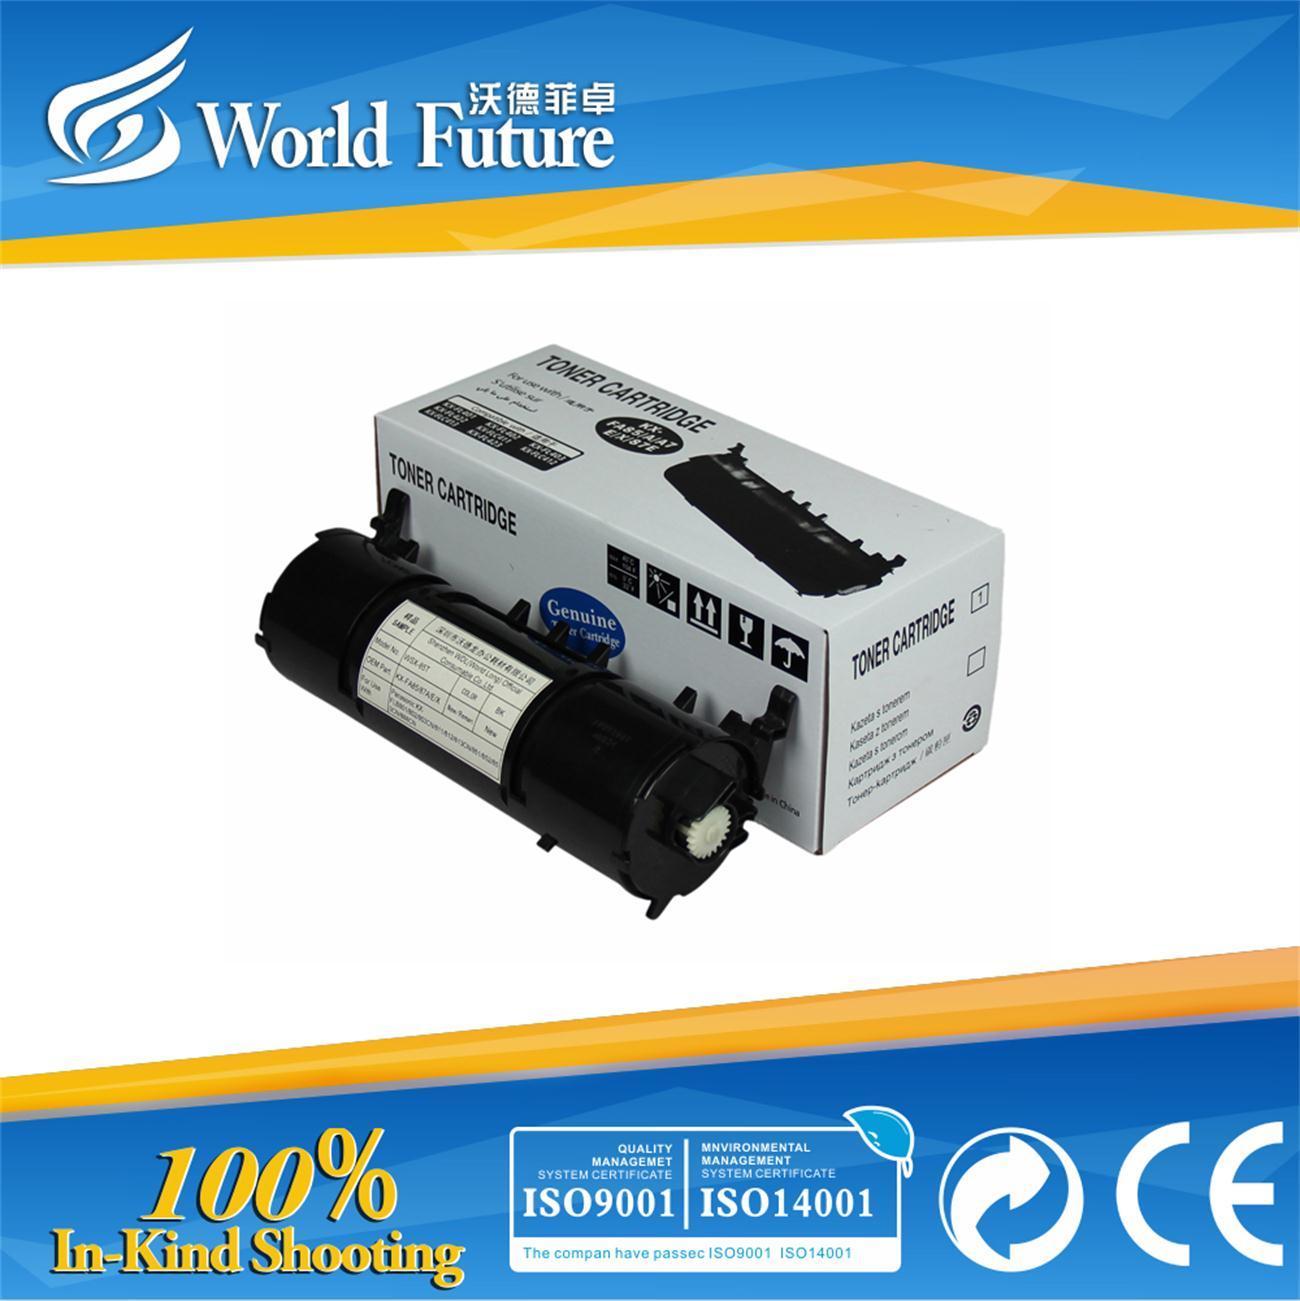 New High Quality Compatible Laser Printer Toner Cartridge for Panasonic (KX-FA85A/E/A7/X) (Toner)